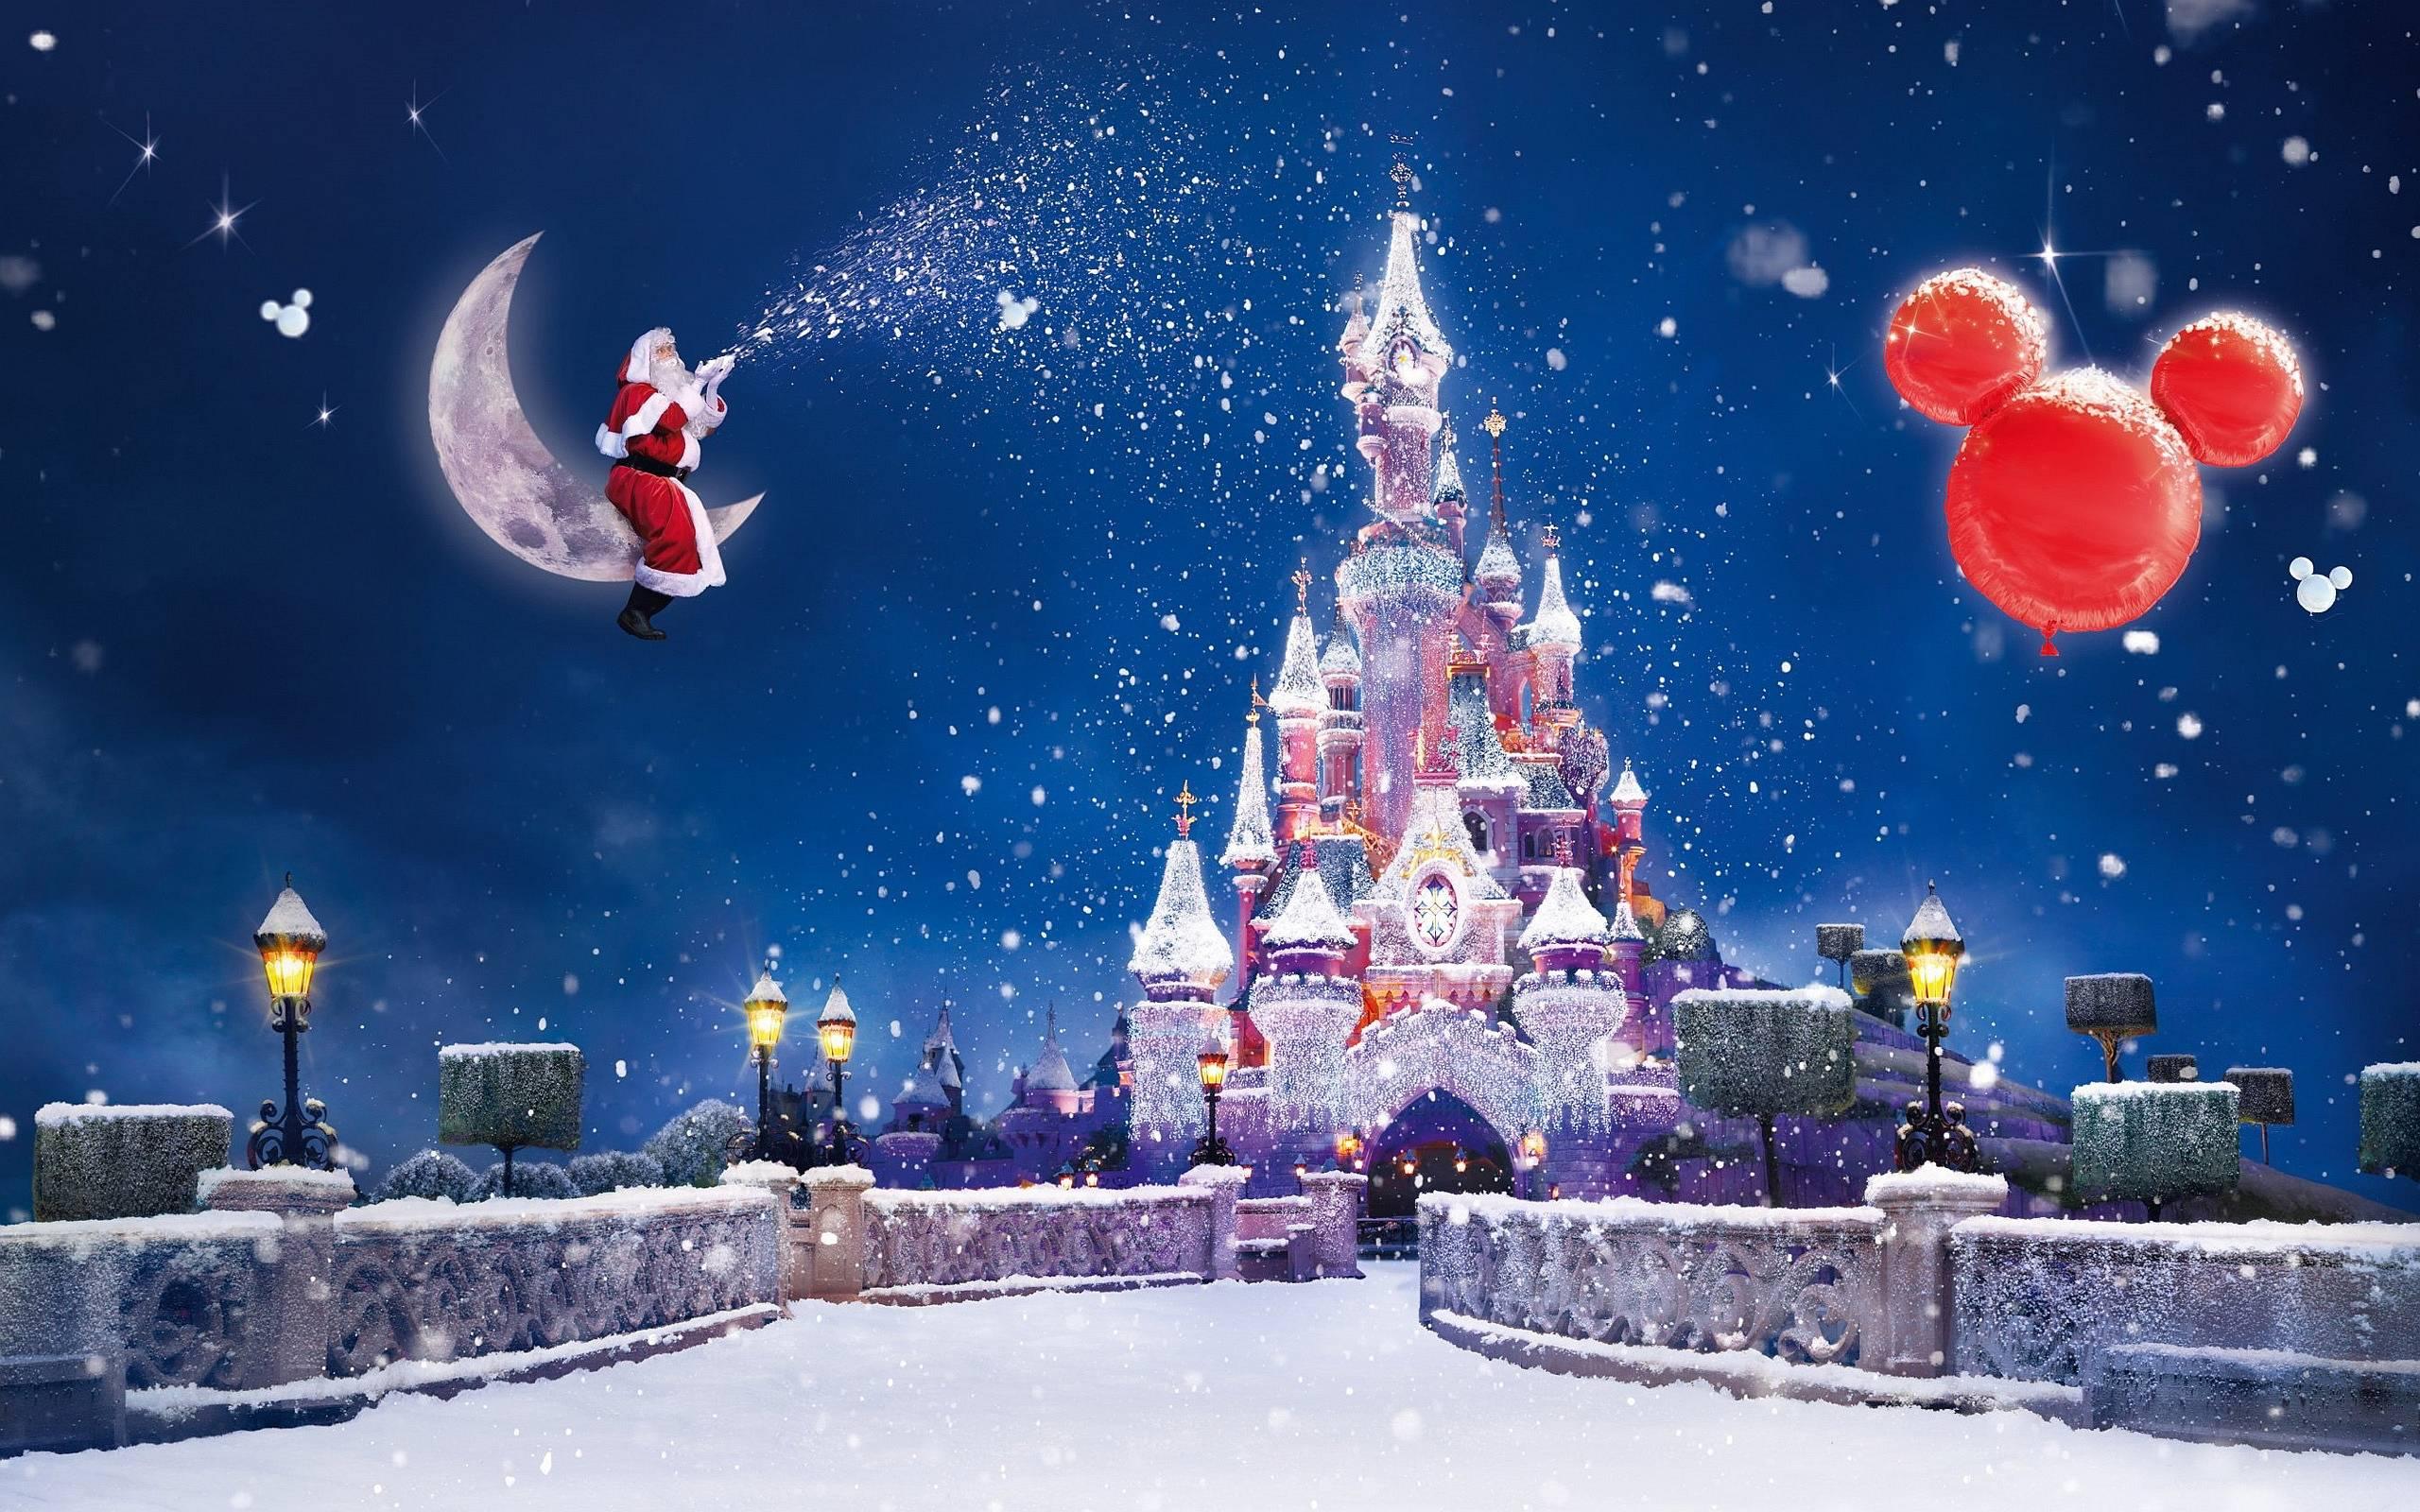 Free Disney World Wallpaper - WallpaperSafari